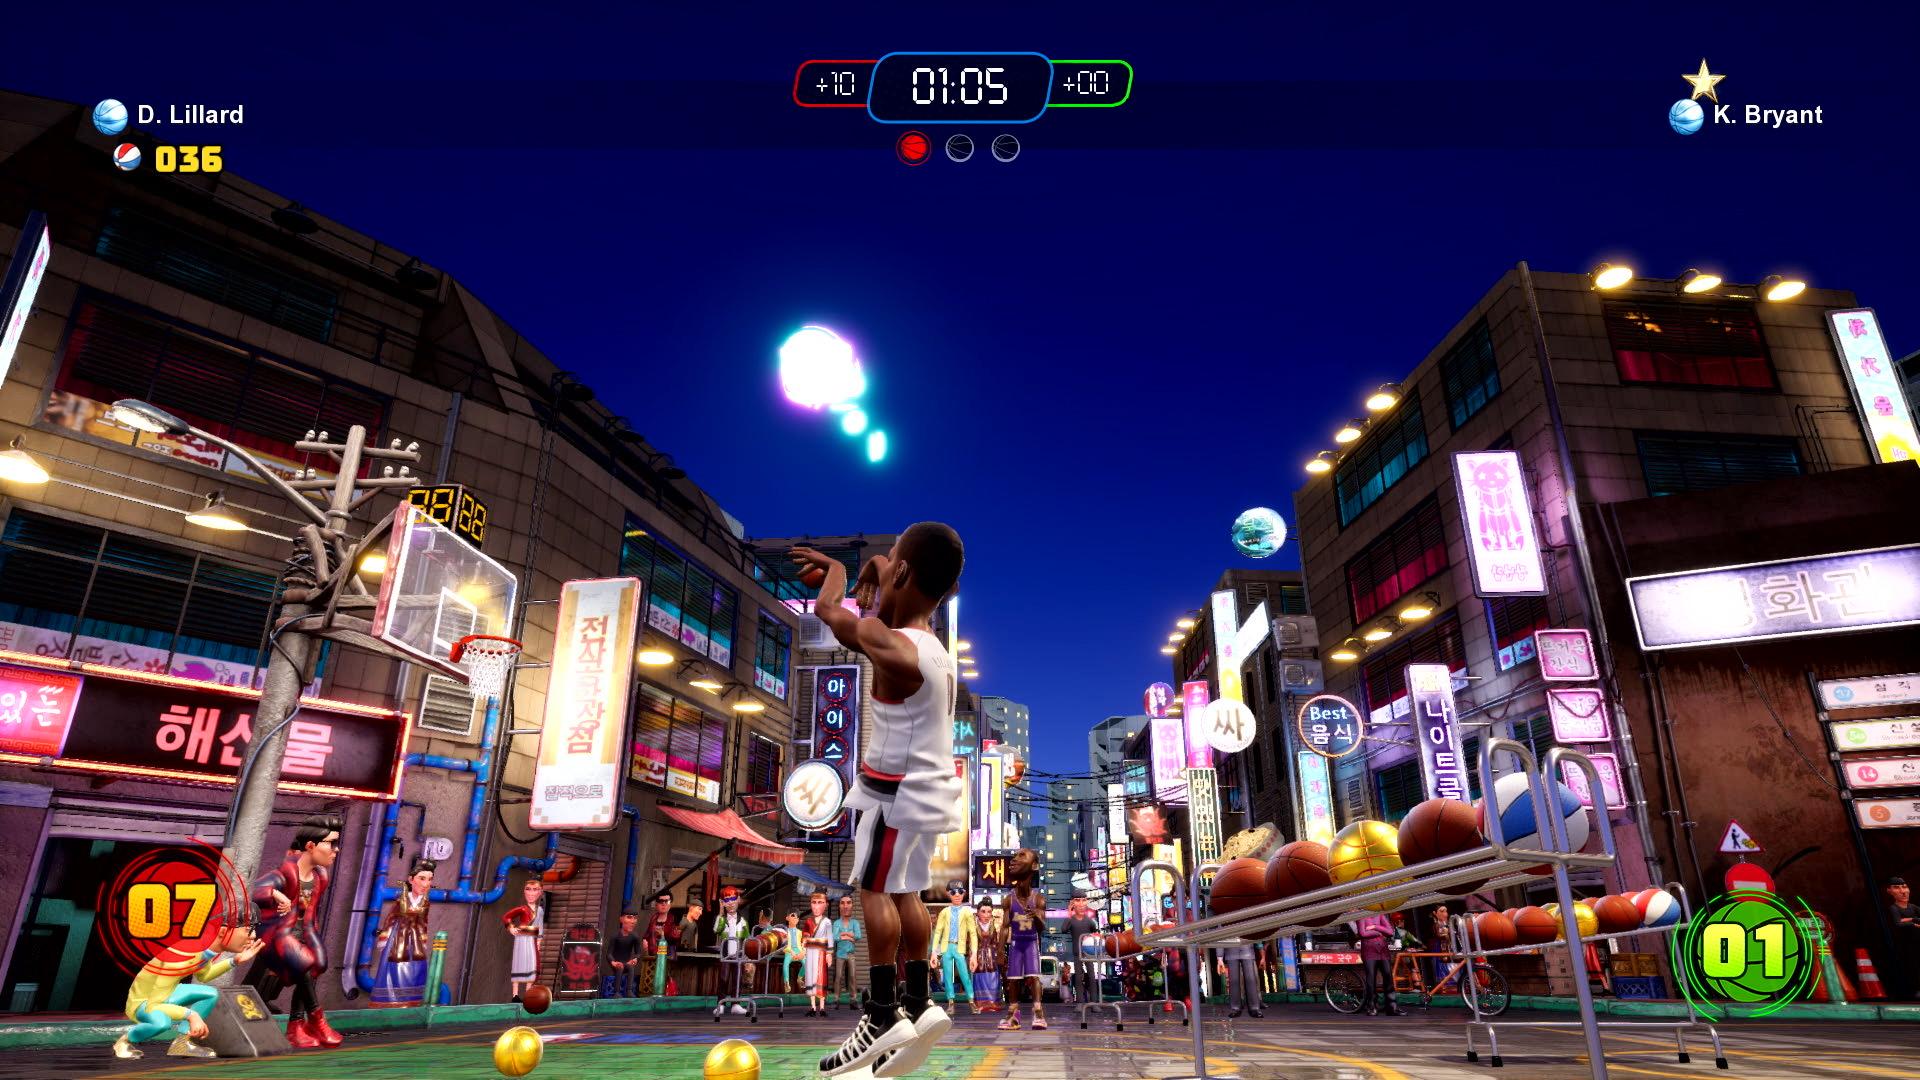 Nba 2k Playgrounds 2 Review: NBA 2K Playgrounds 2 PC CD Key, Key